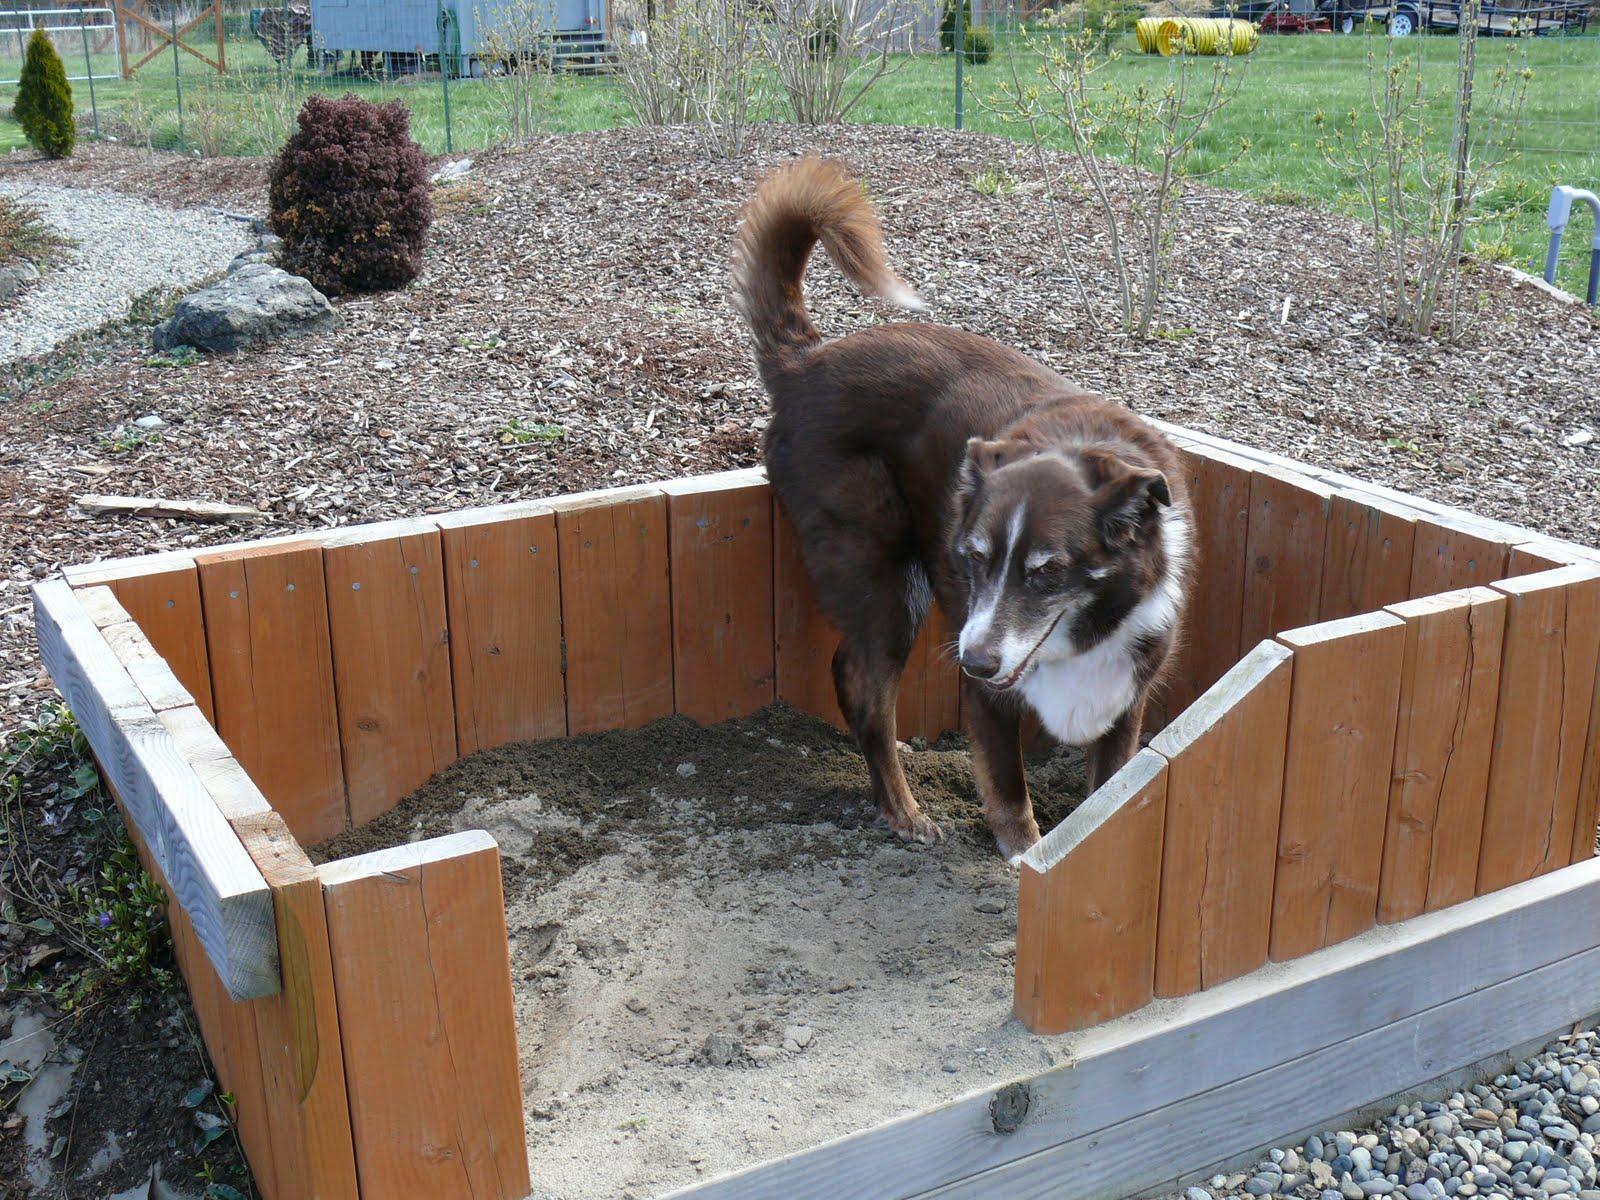 Dog Friendly Backyard Ideas beautiful garden landscaping ideas for dogs 28 inside inspiration article April 20 2010